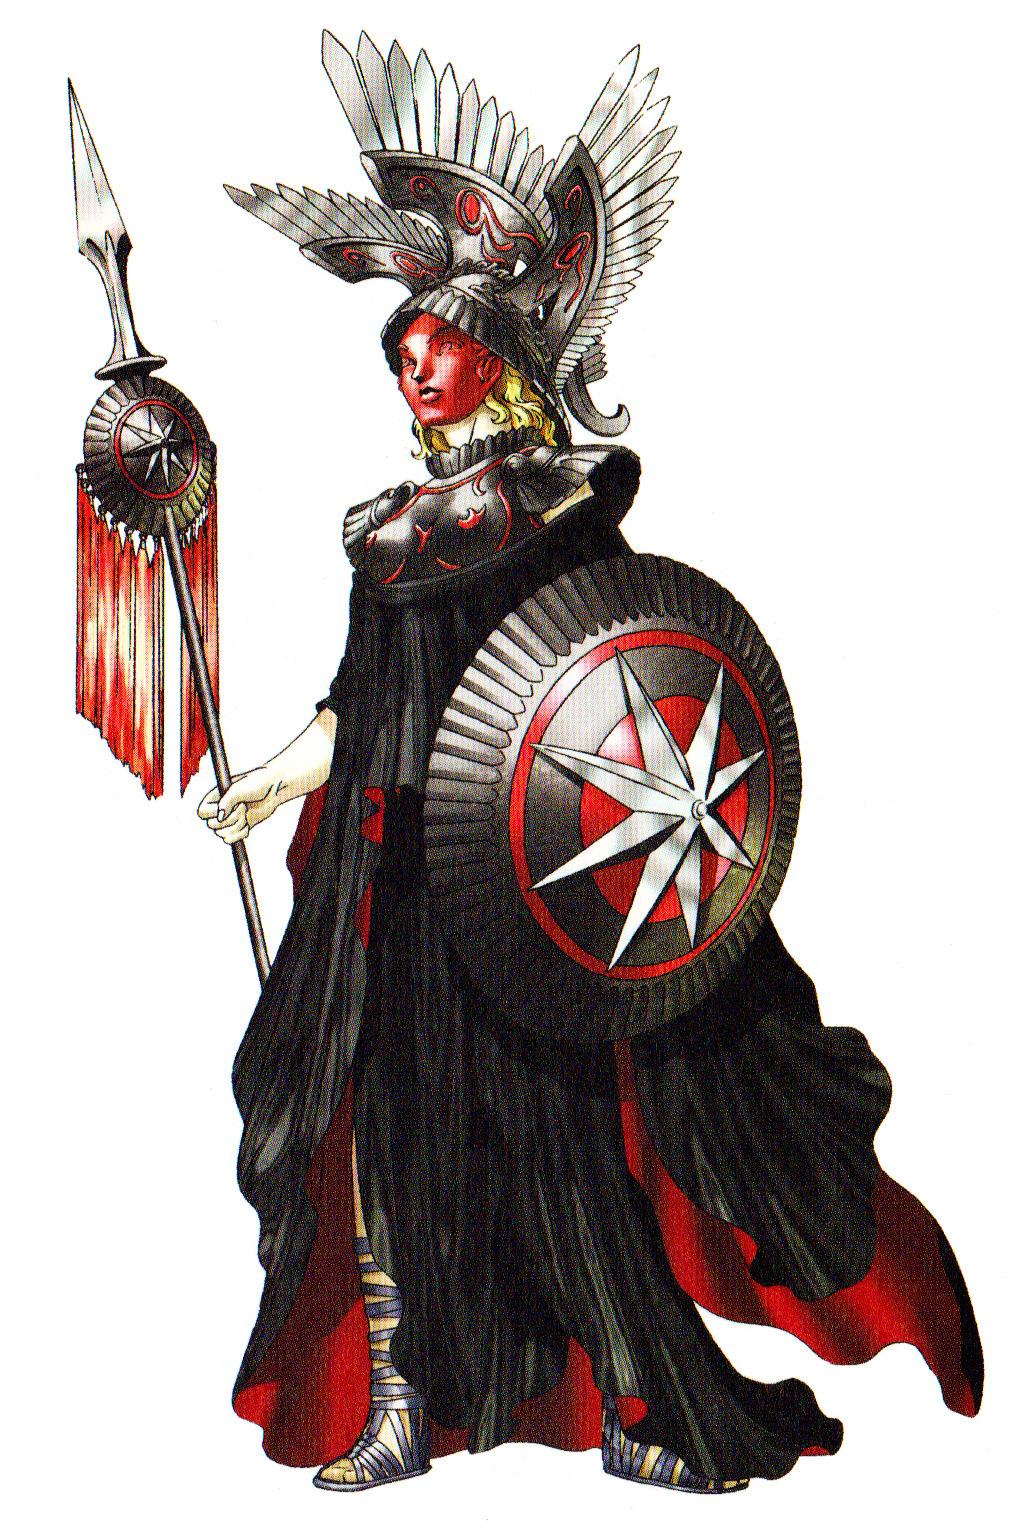 Pallas Athena Megami Tensei Wiki Fandom Powered By Wikia